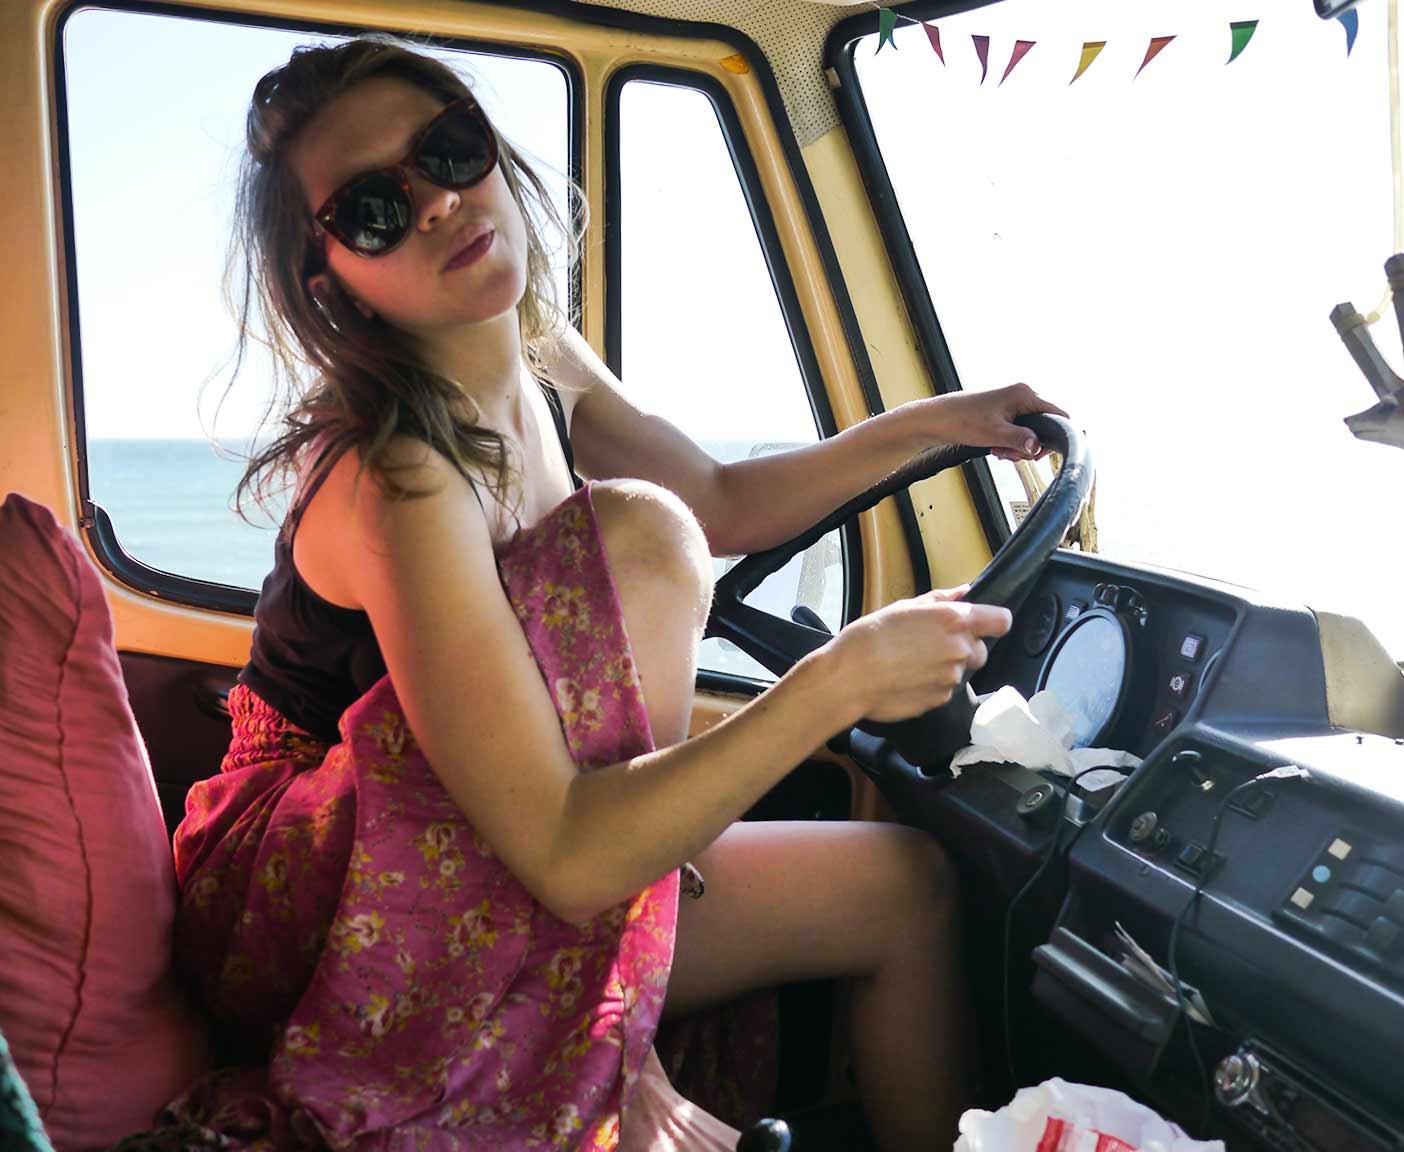 Frau im Camper am Steuer Mercedes